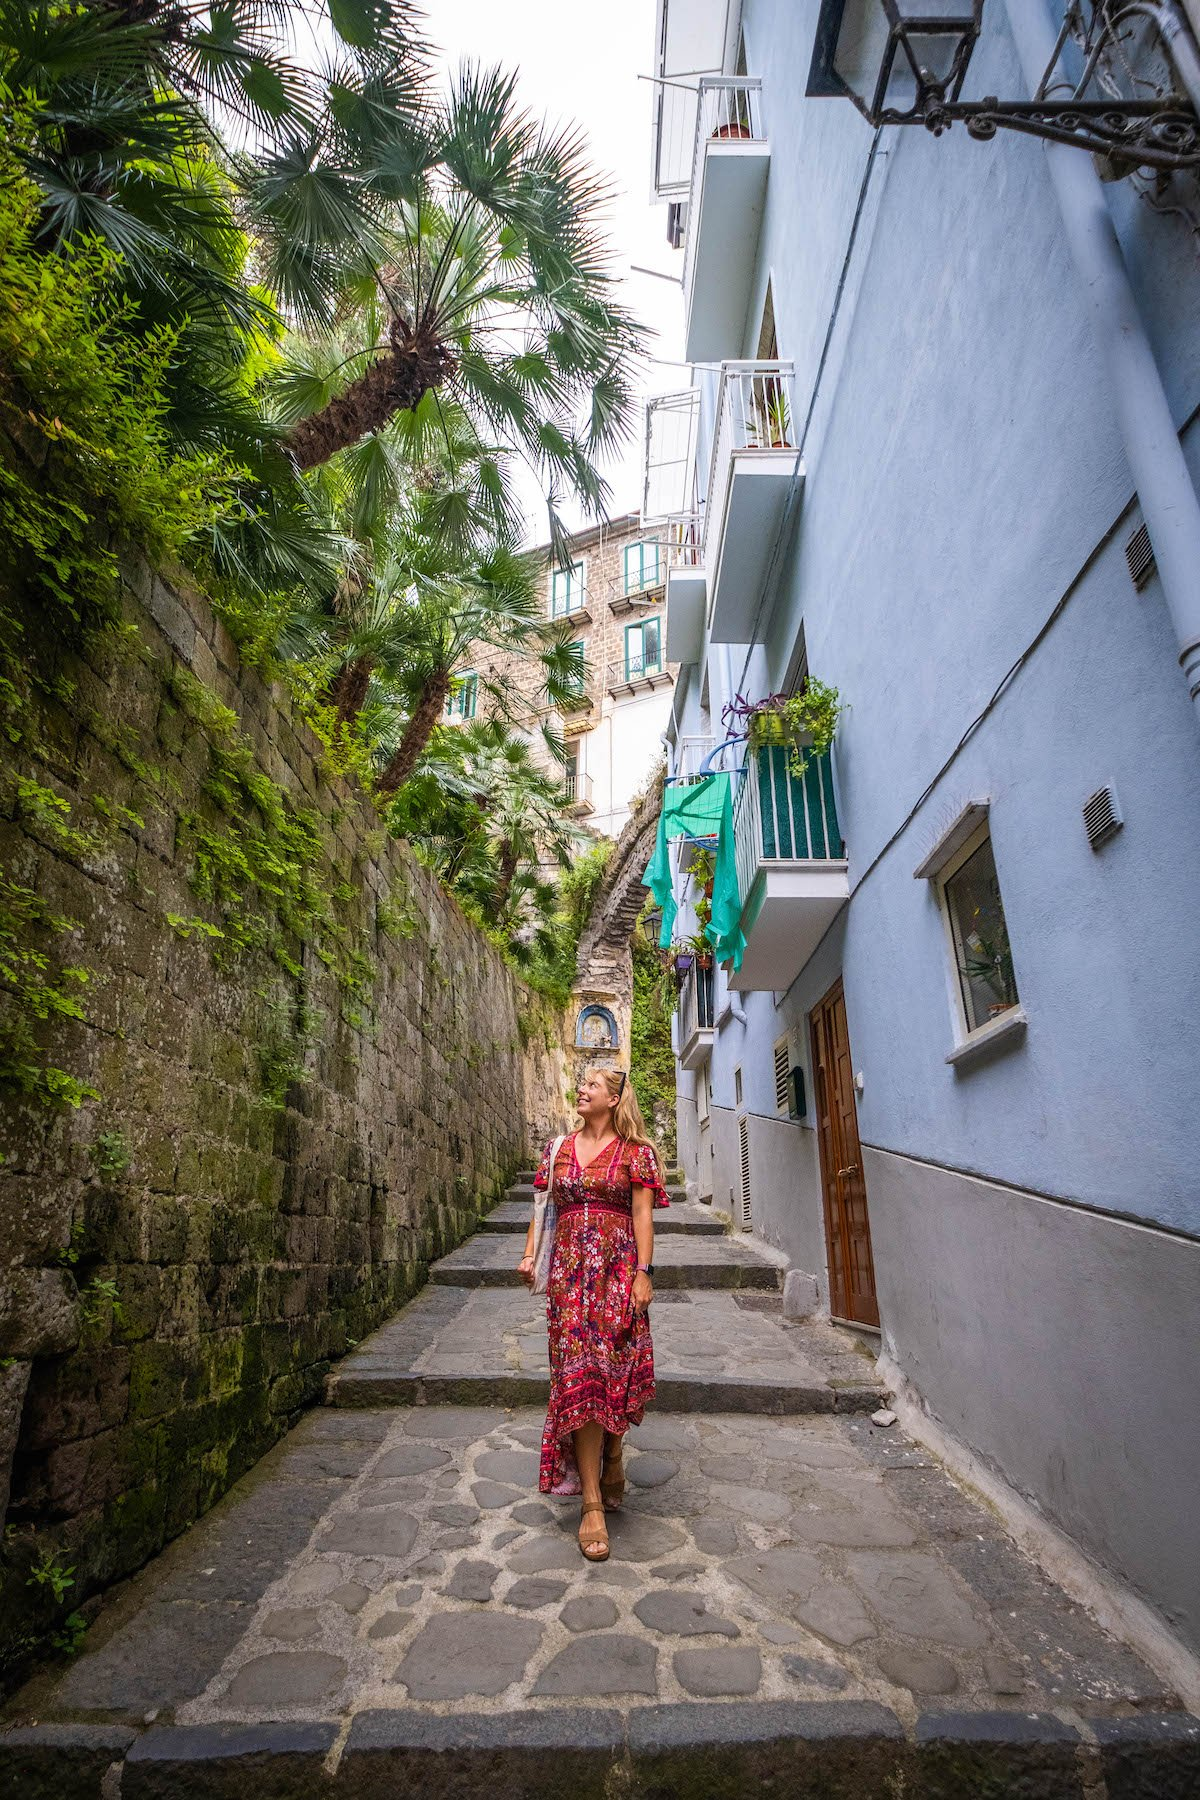 Natasha Walking through the streets of Sorrento To Marina Grande